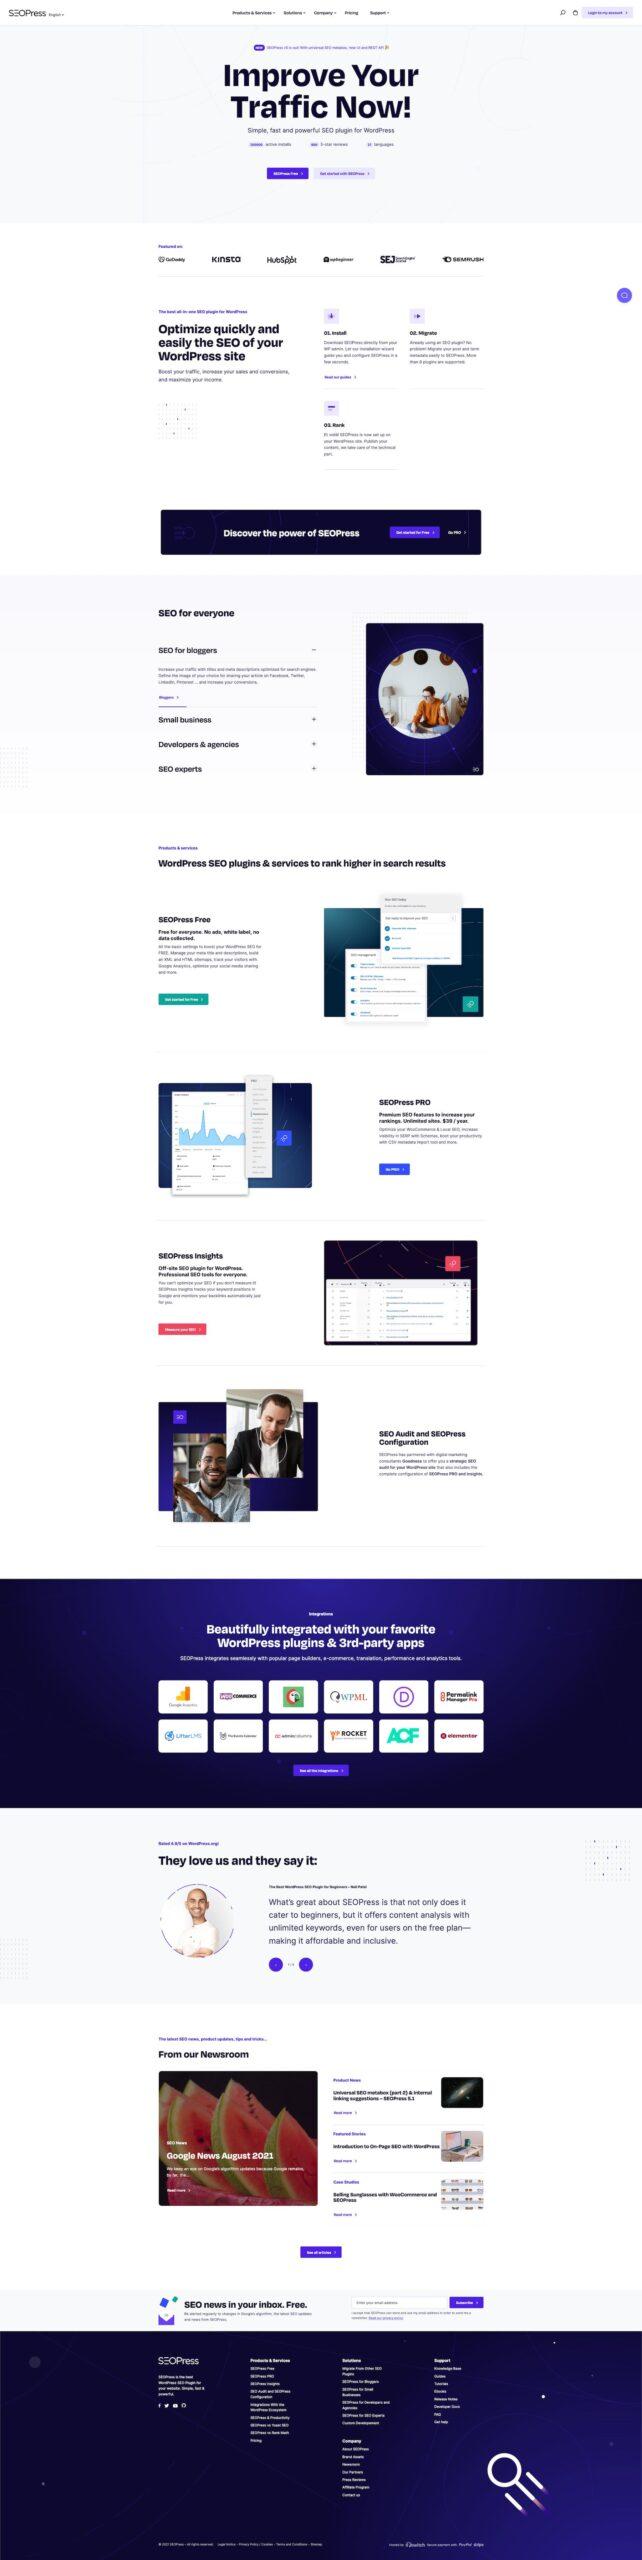 SEOPress new website (homepage)